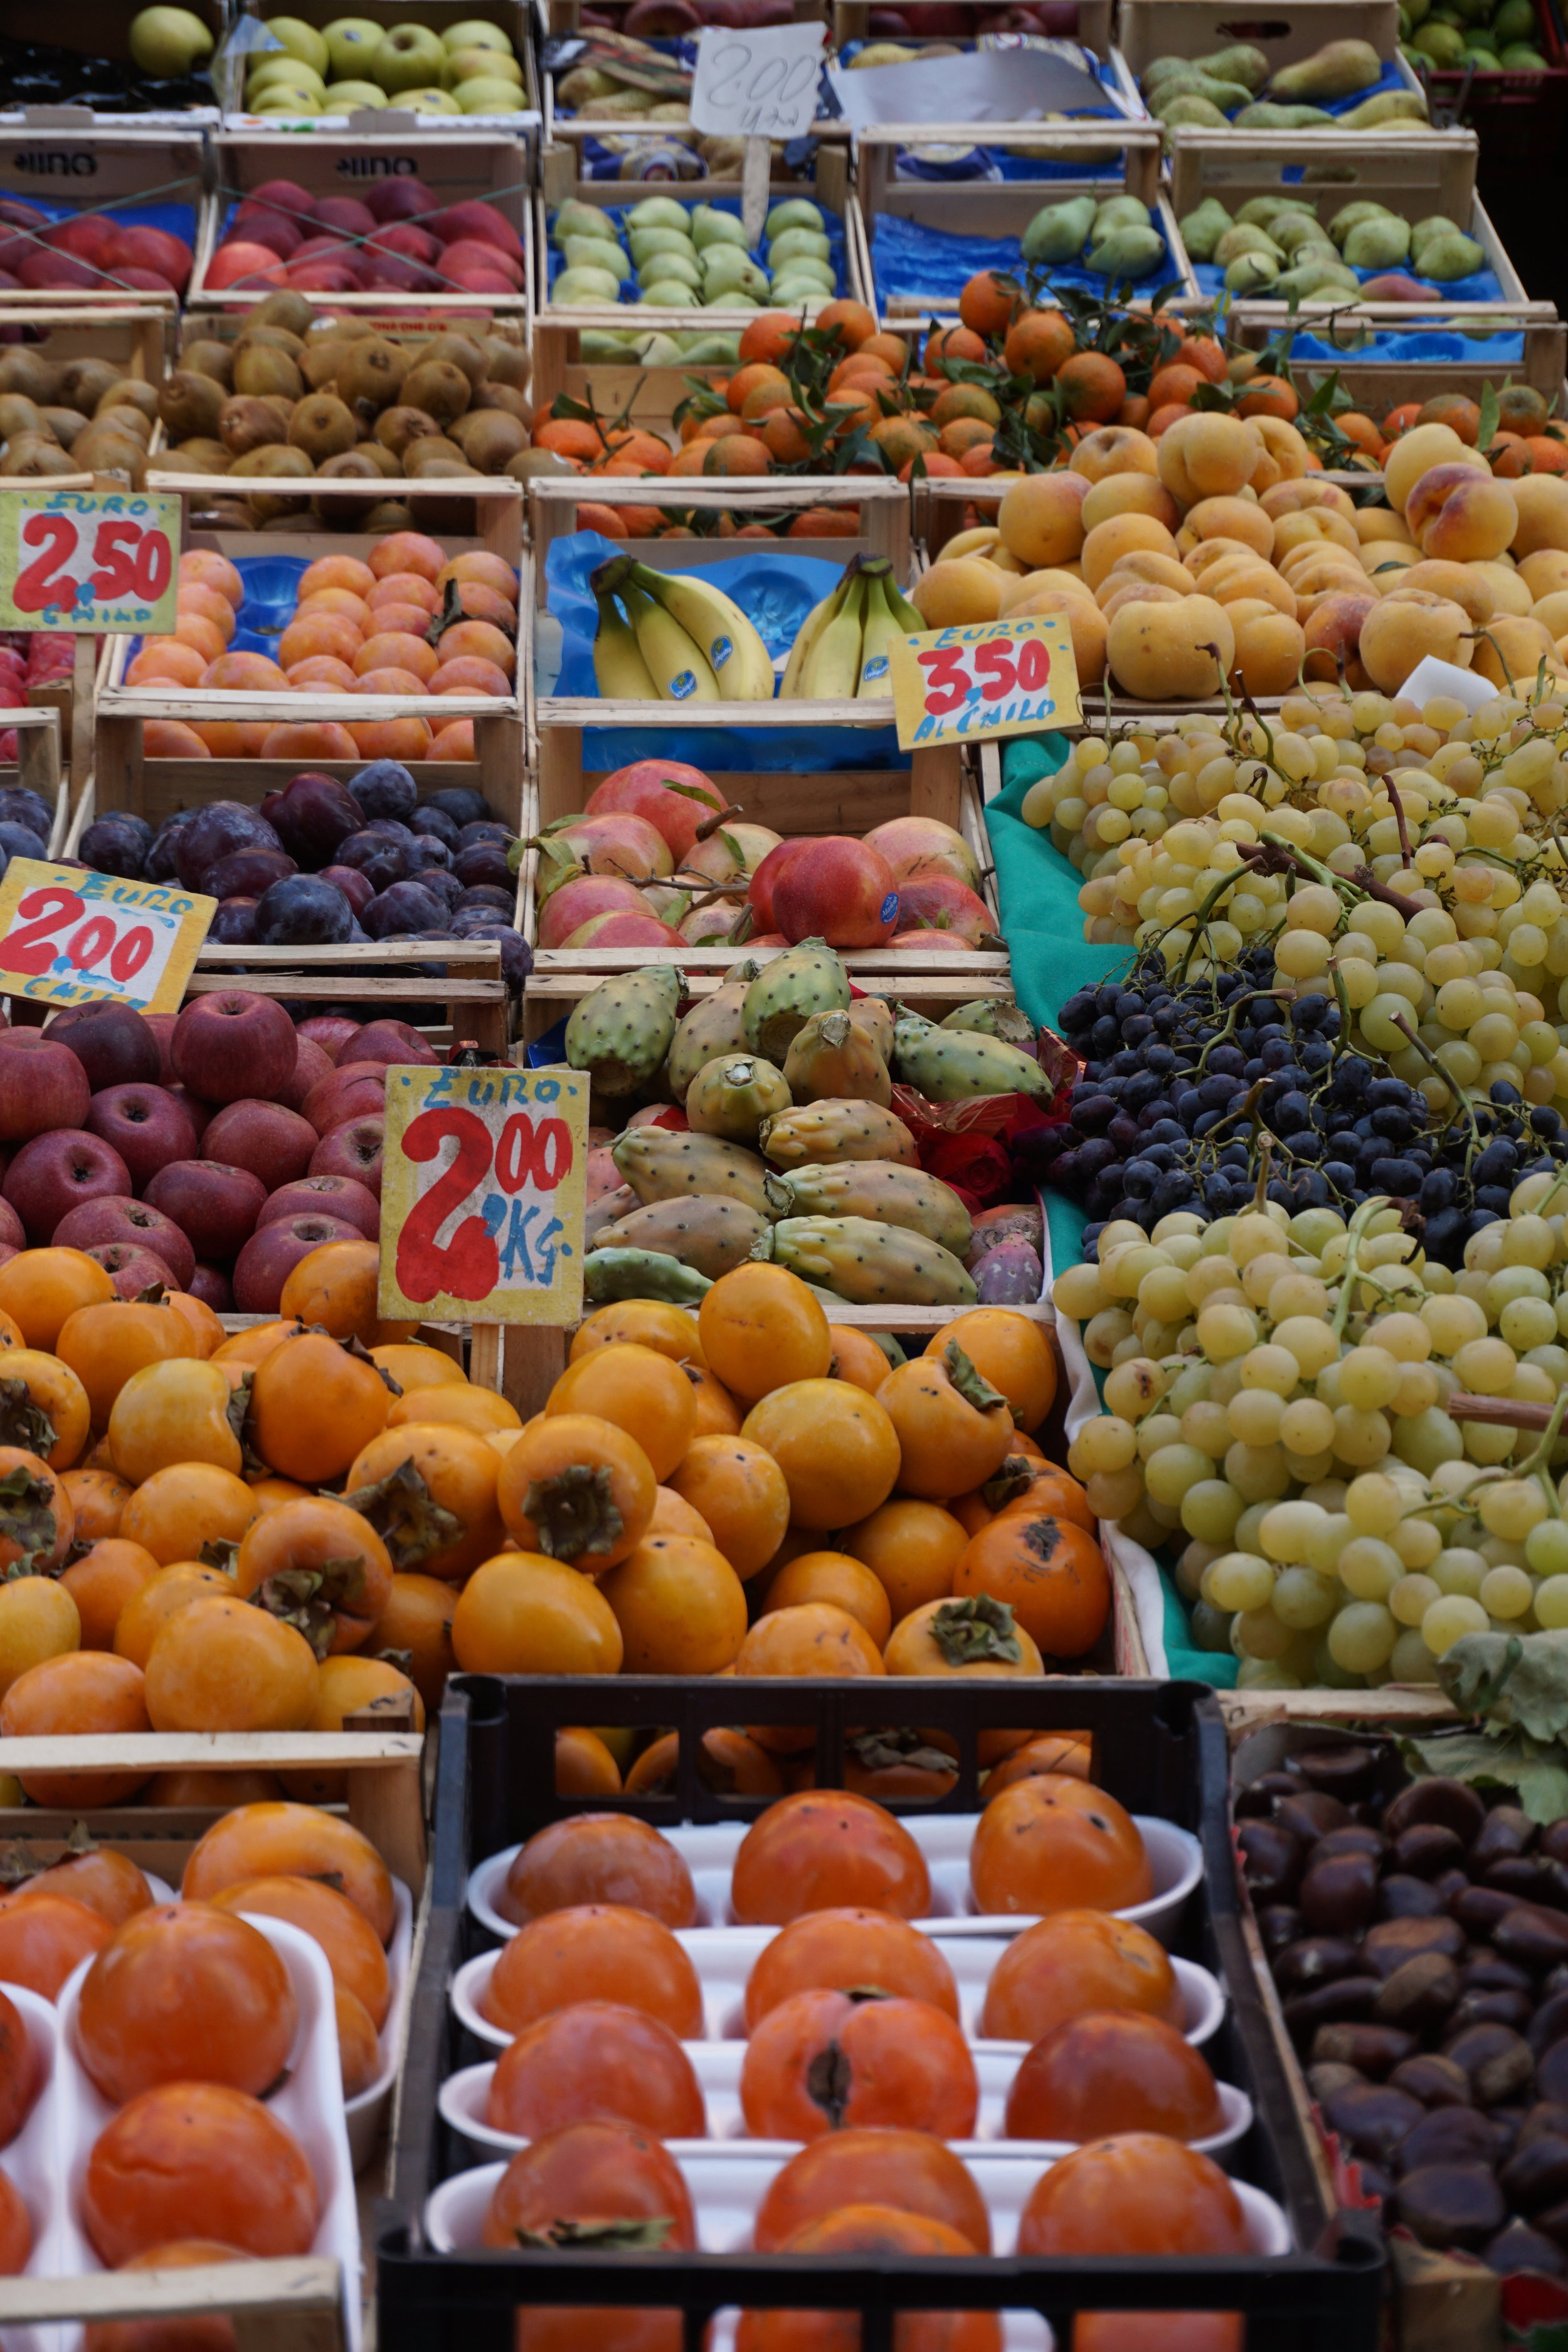 Open air market on the Mediterranean coast, Italy.